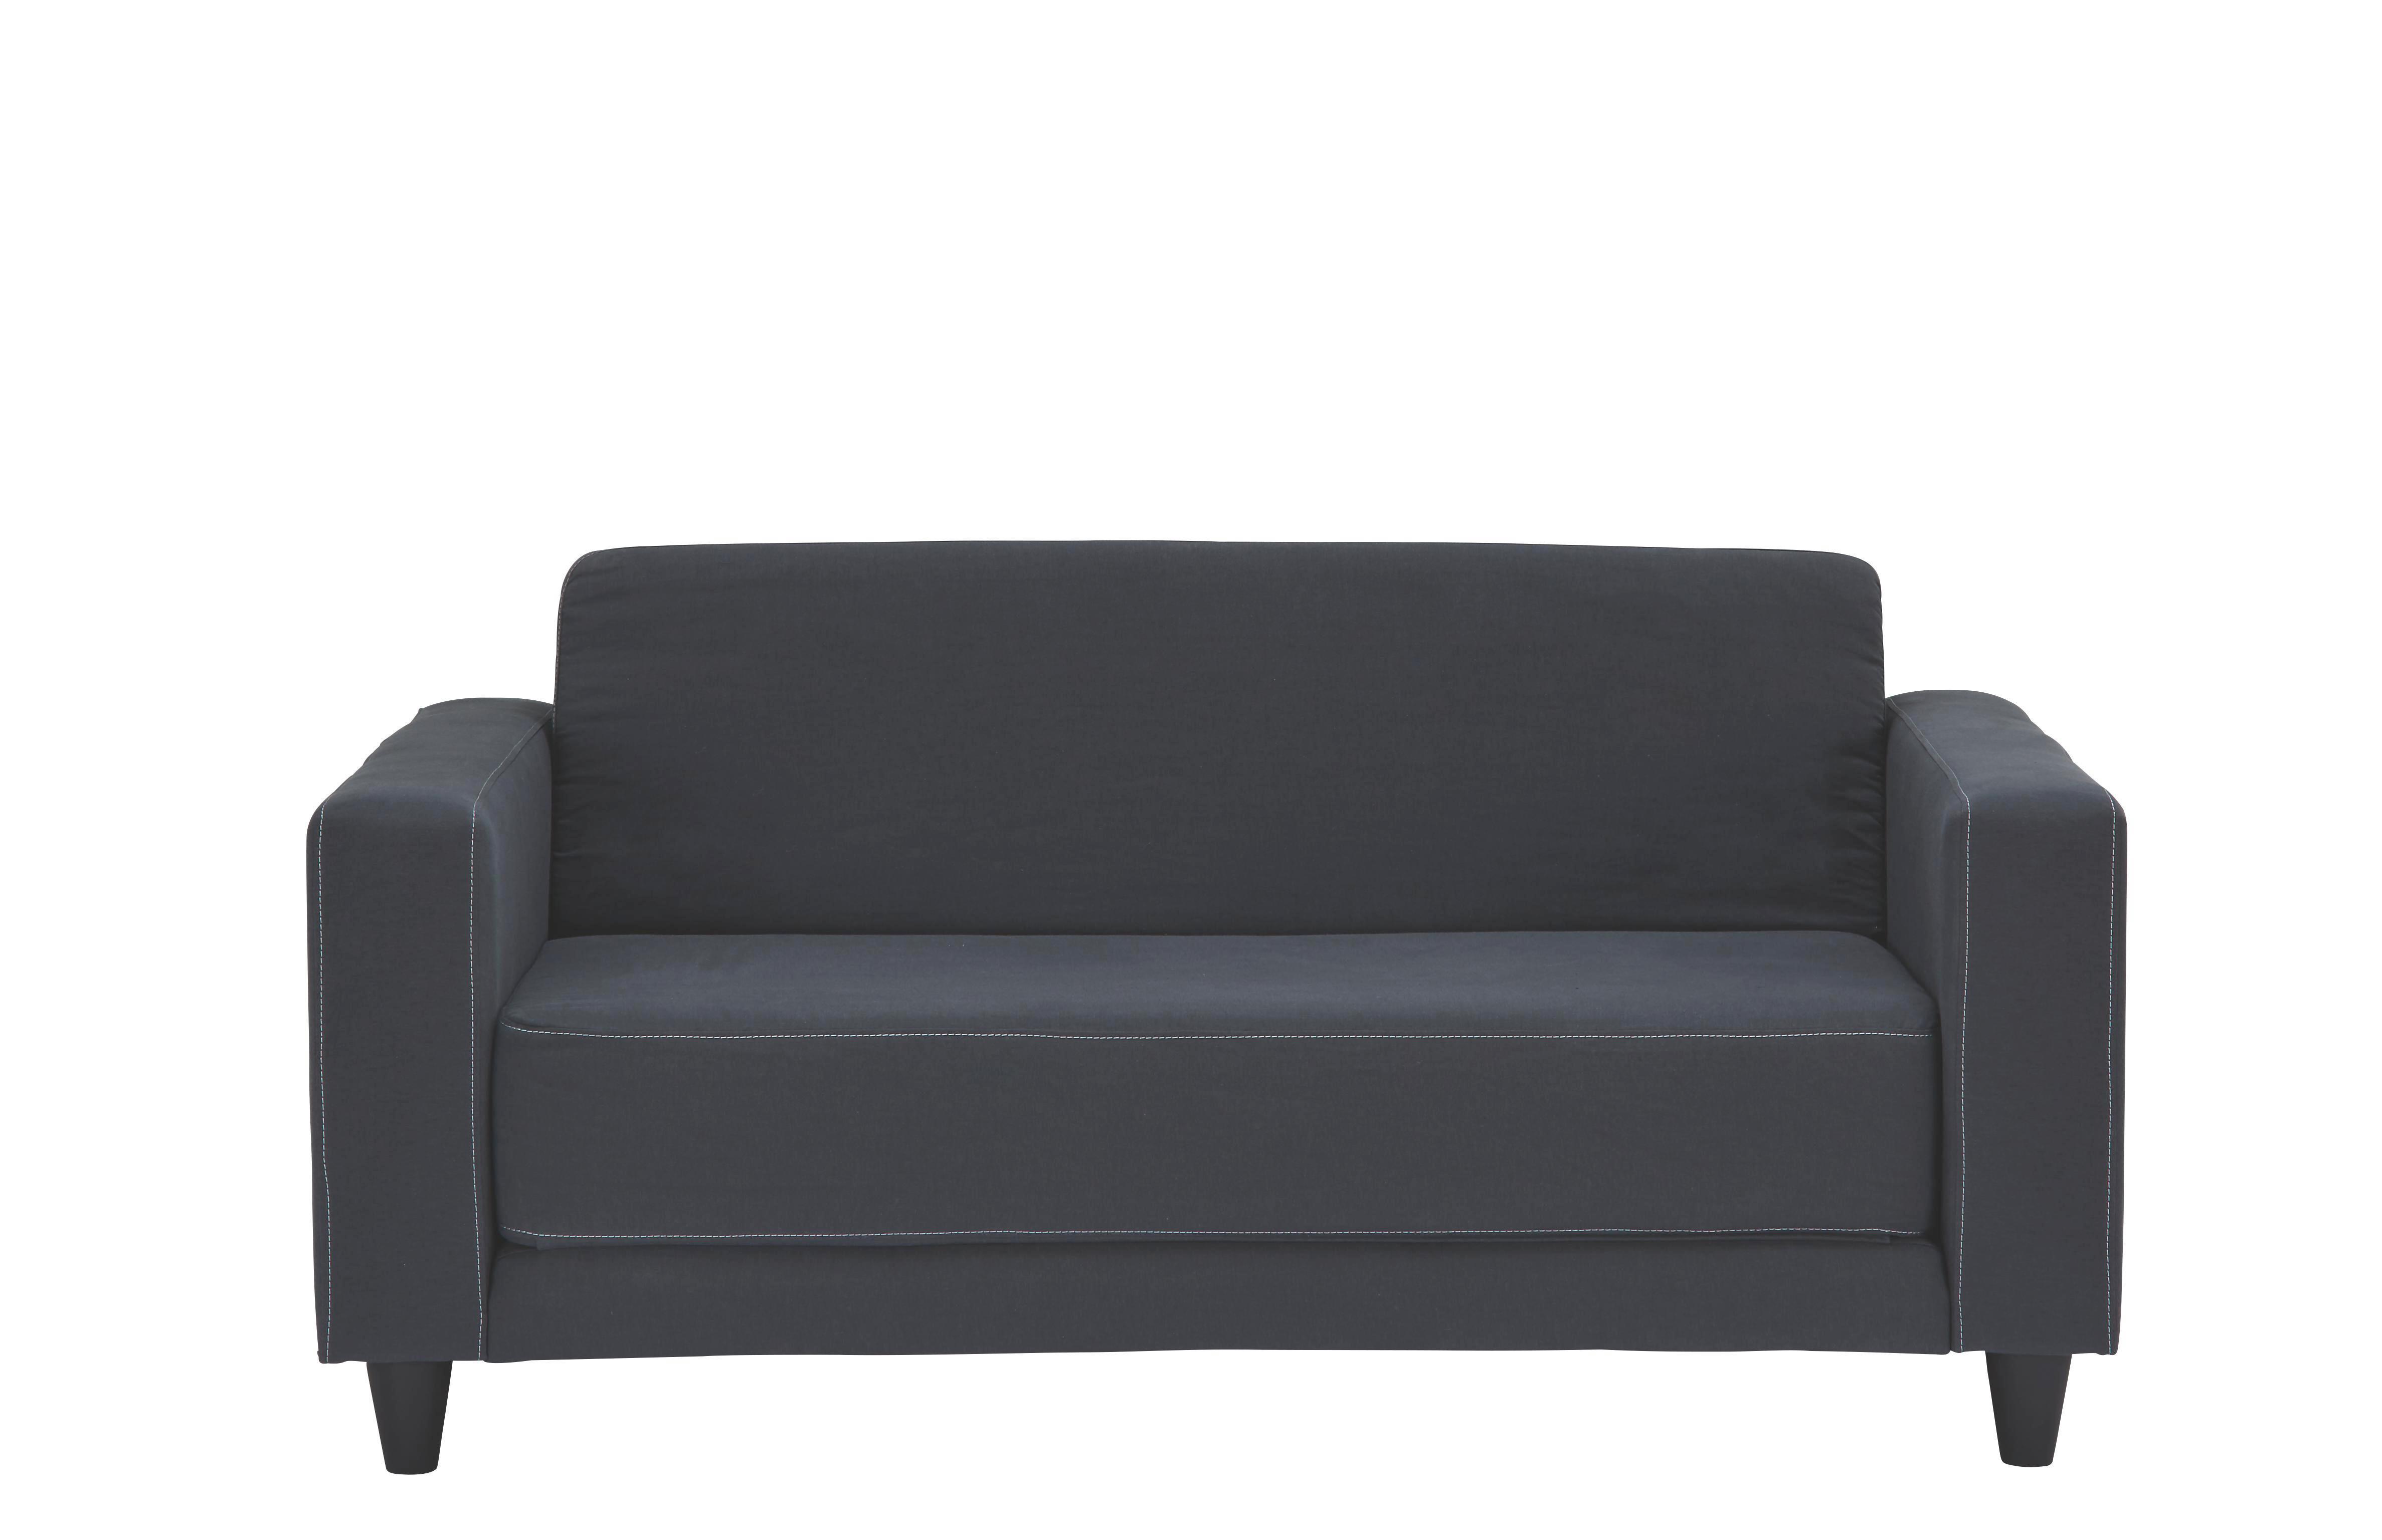 Schlafsofa Grau - Hellgrau/Schwarz, Kunststoff/Textil (146/71/81cm) - MÖMAX modern living